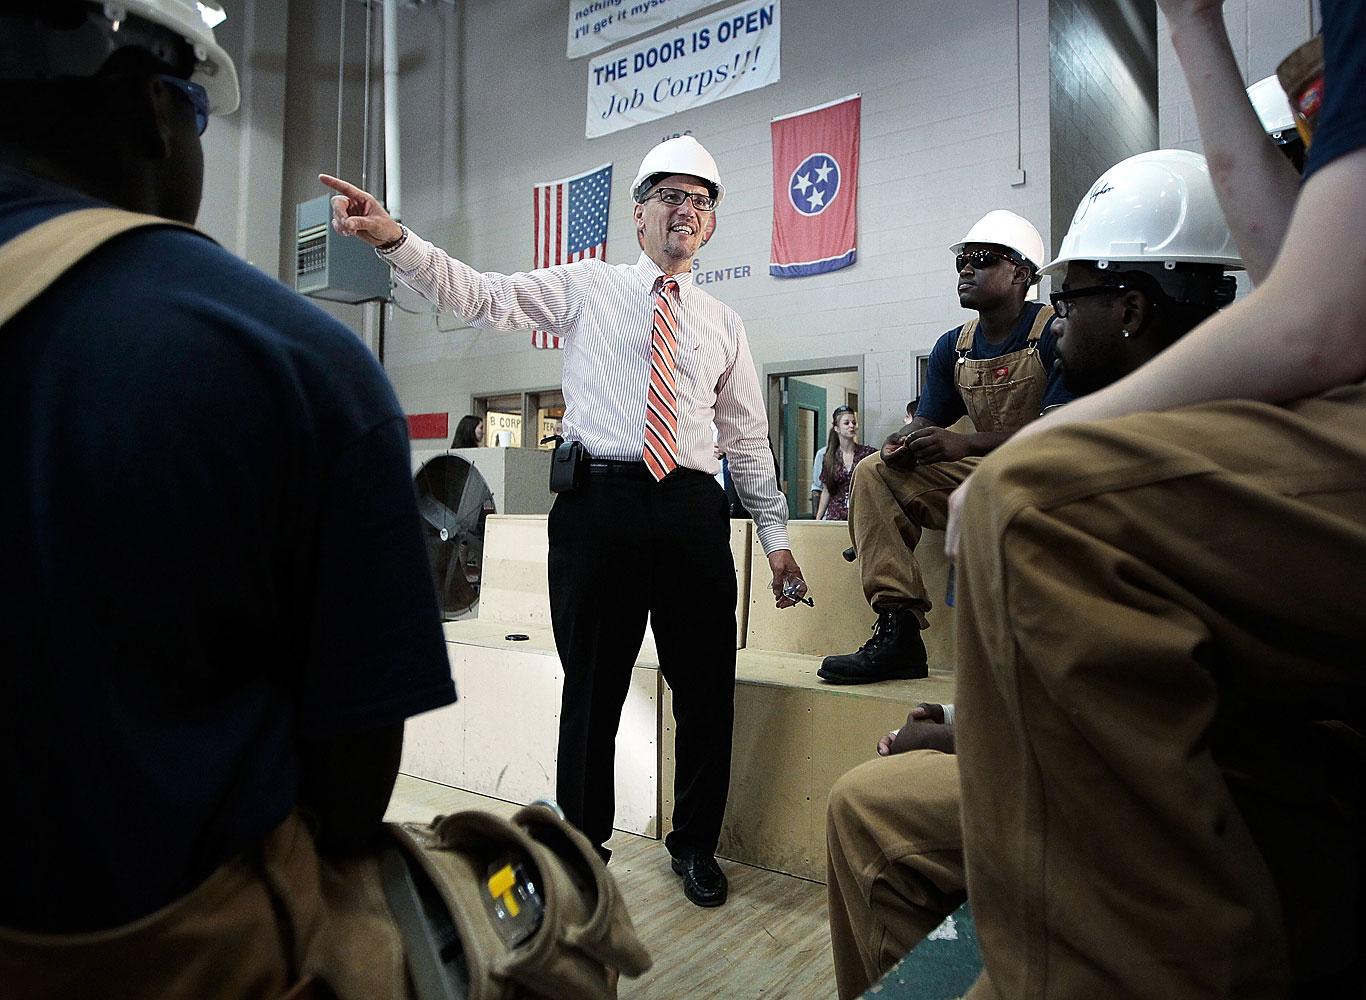 U.S. Labor Secretary Thomas Perez talks with carpentry students during a trip to the Benjamin L. Hooks Job Corps Center in Memphis, Tenn., Aug. 20, 2014.